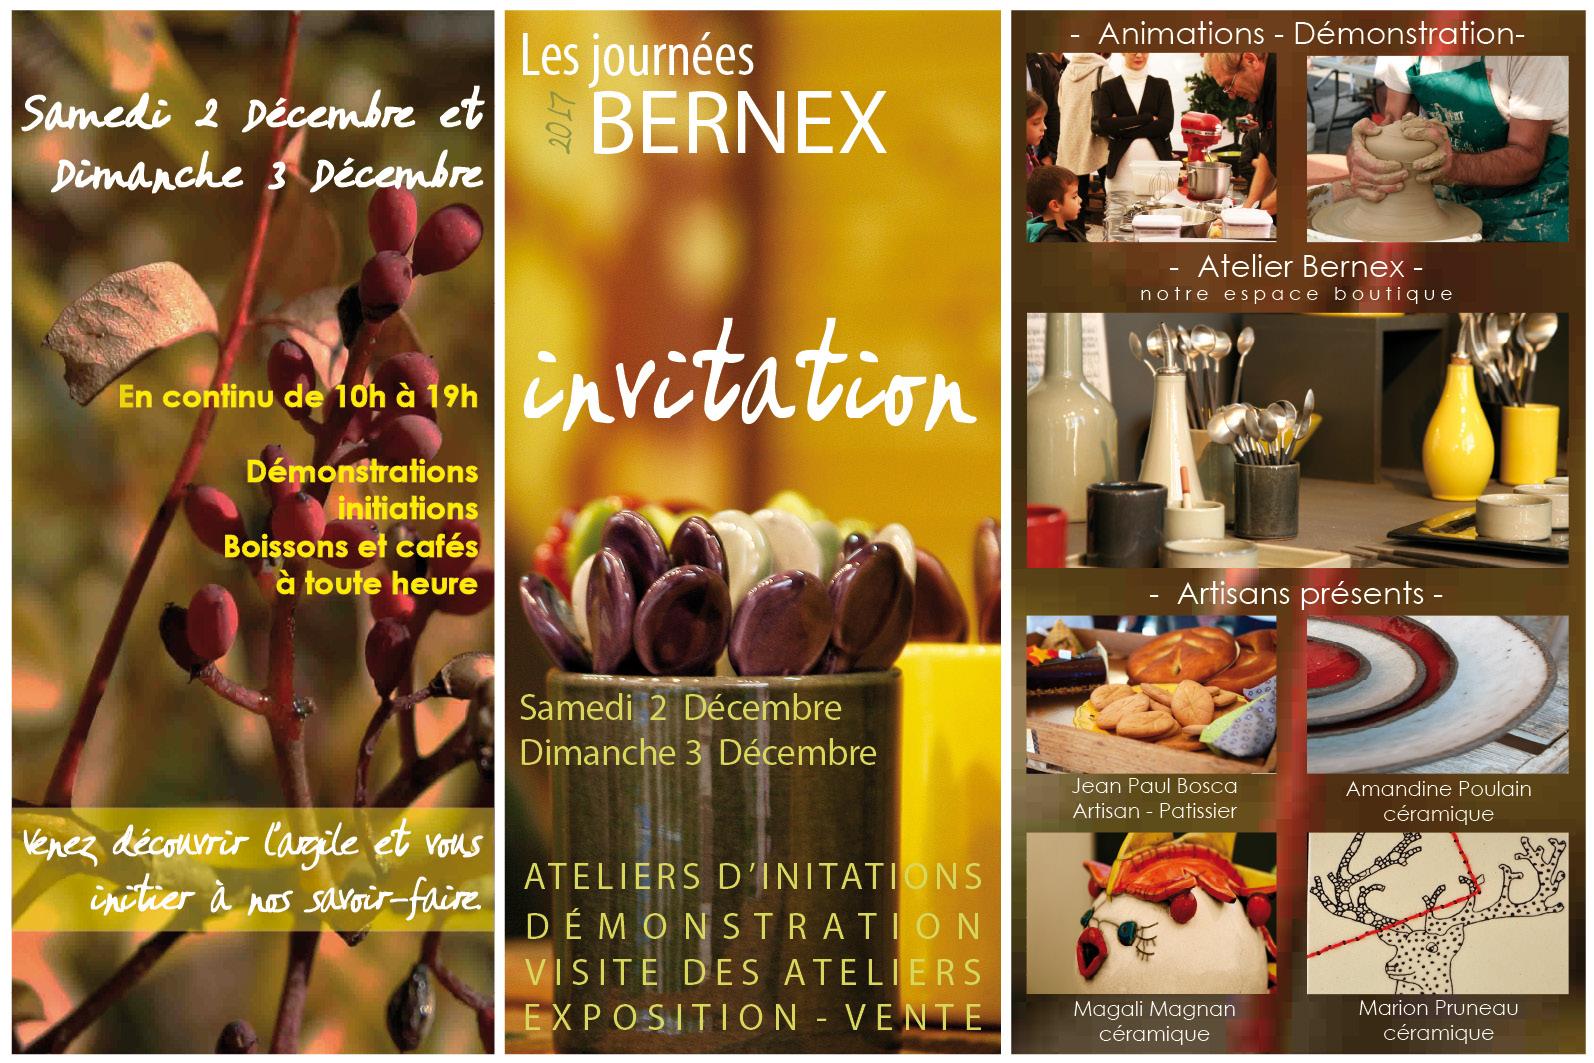 Journées Bernex - Manifestation -Exposition